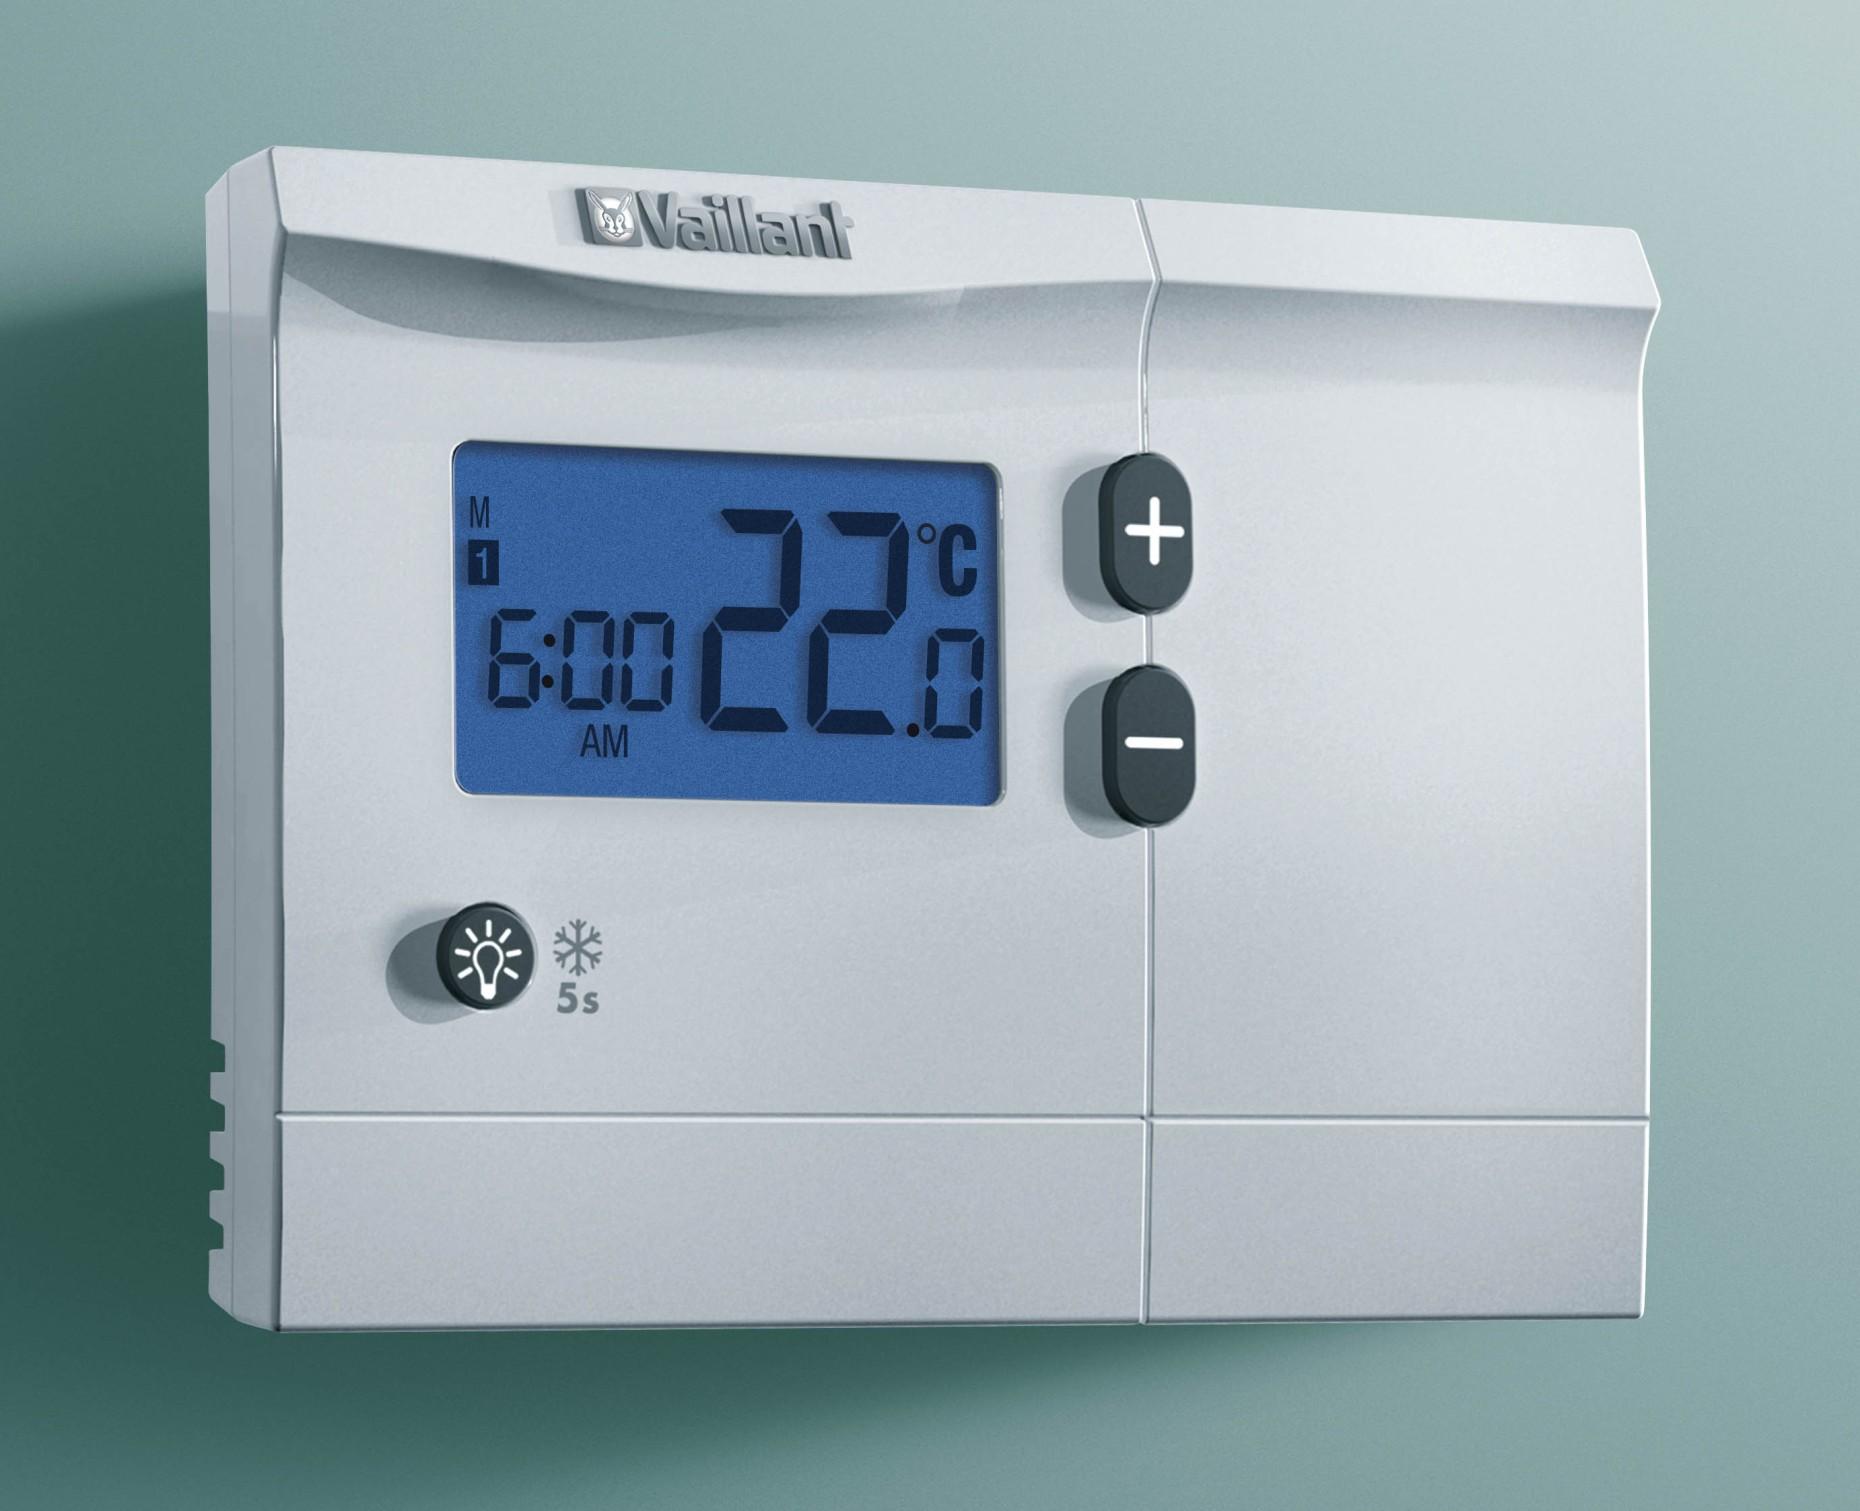 raumthermostat calormatic 250 vaillant. Black Bedroom Furniture Sets. Home Design Ideas